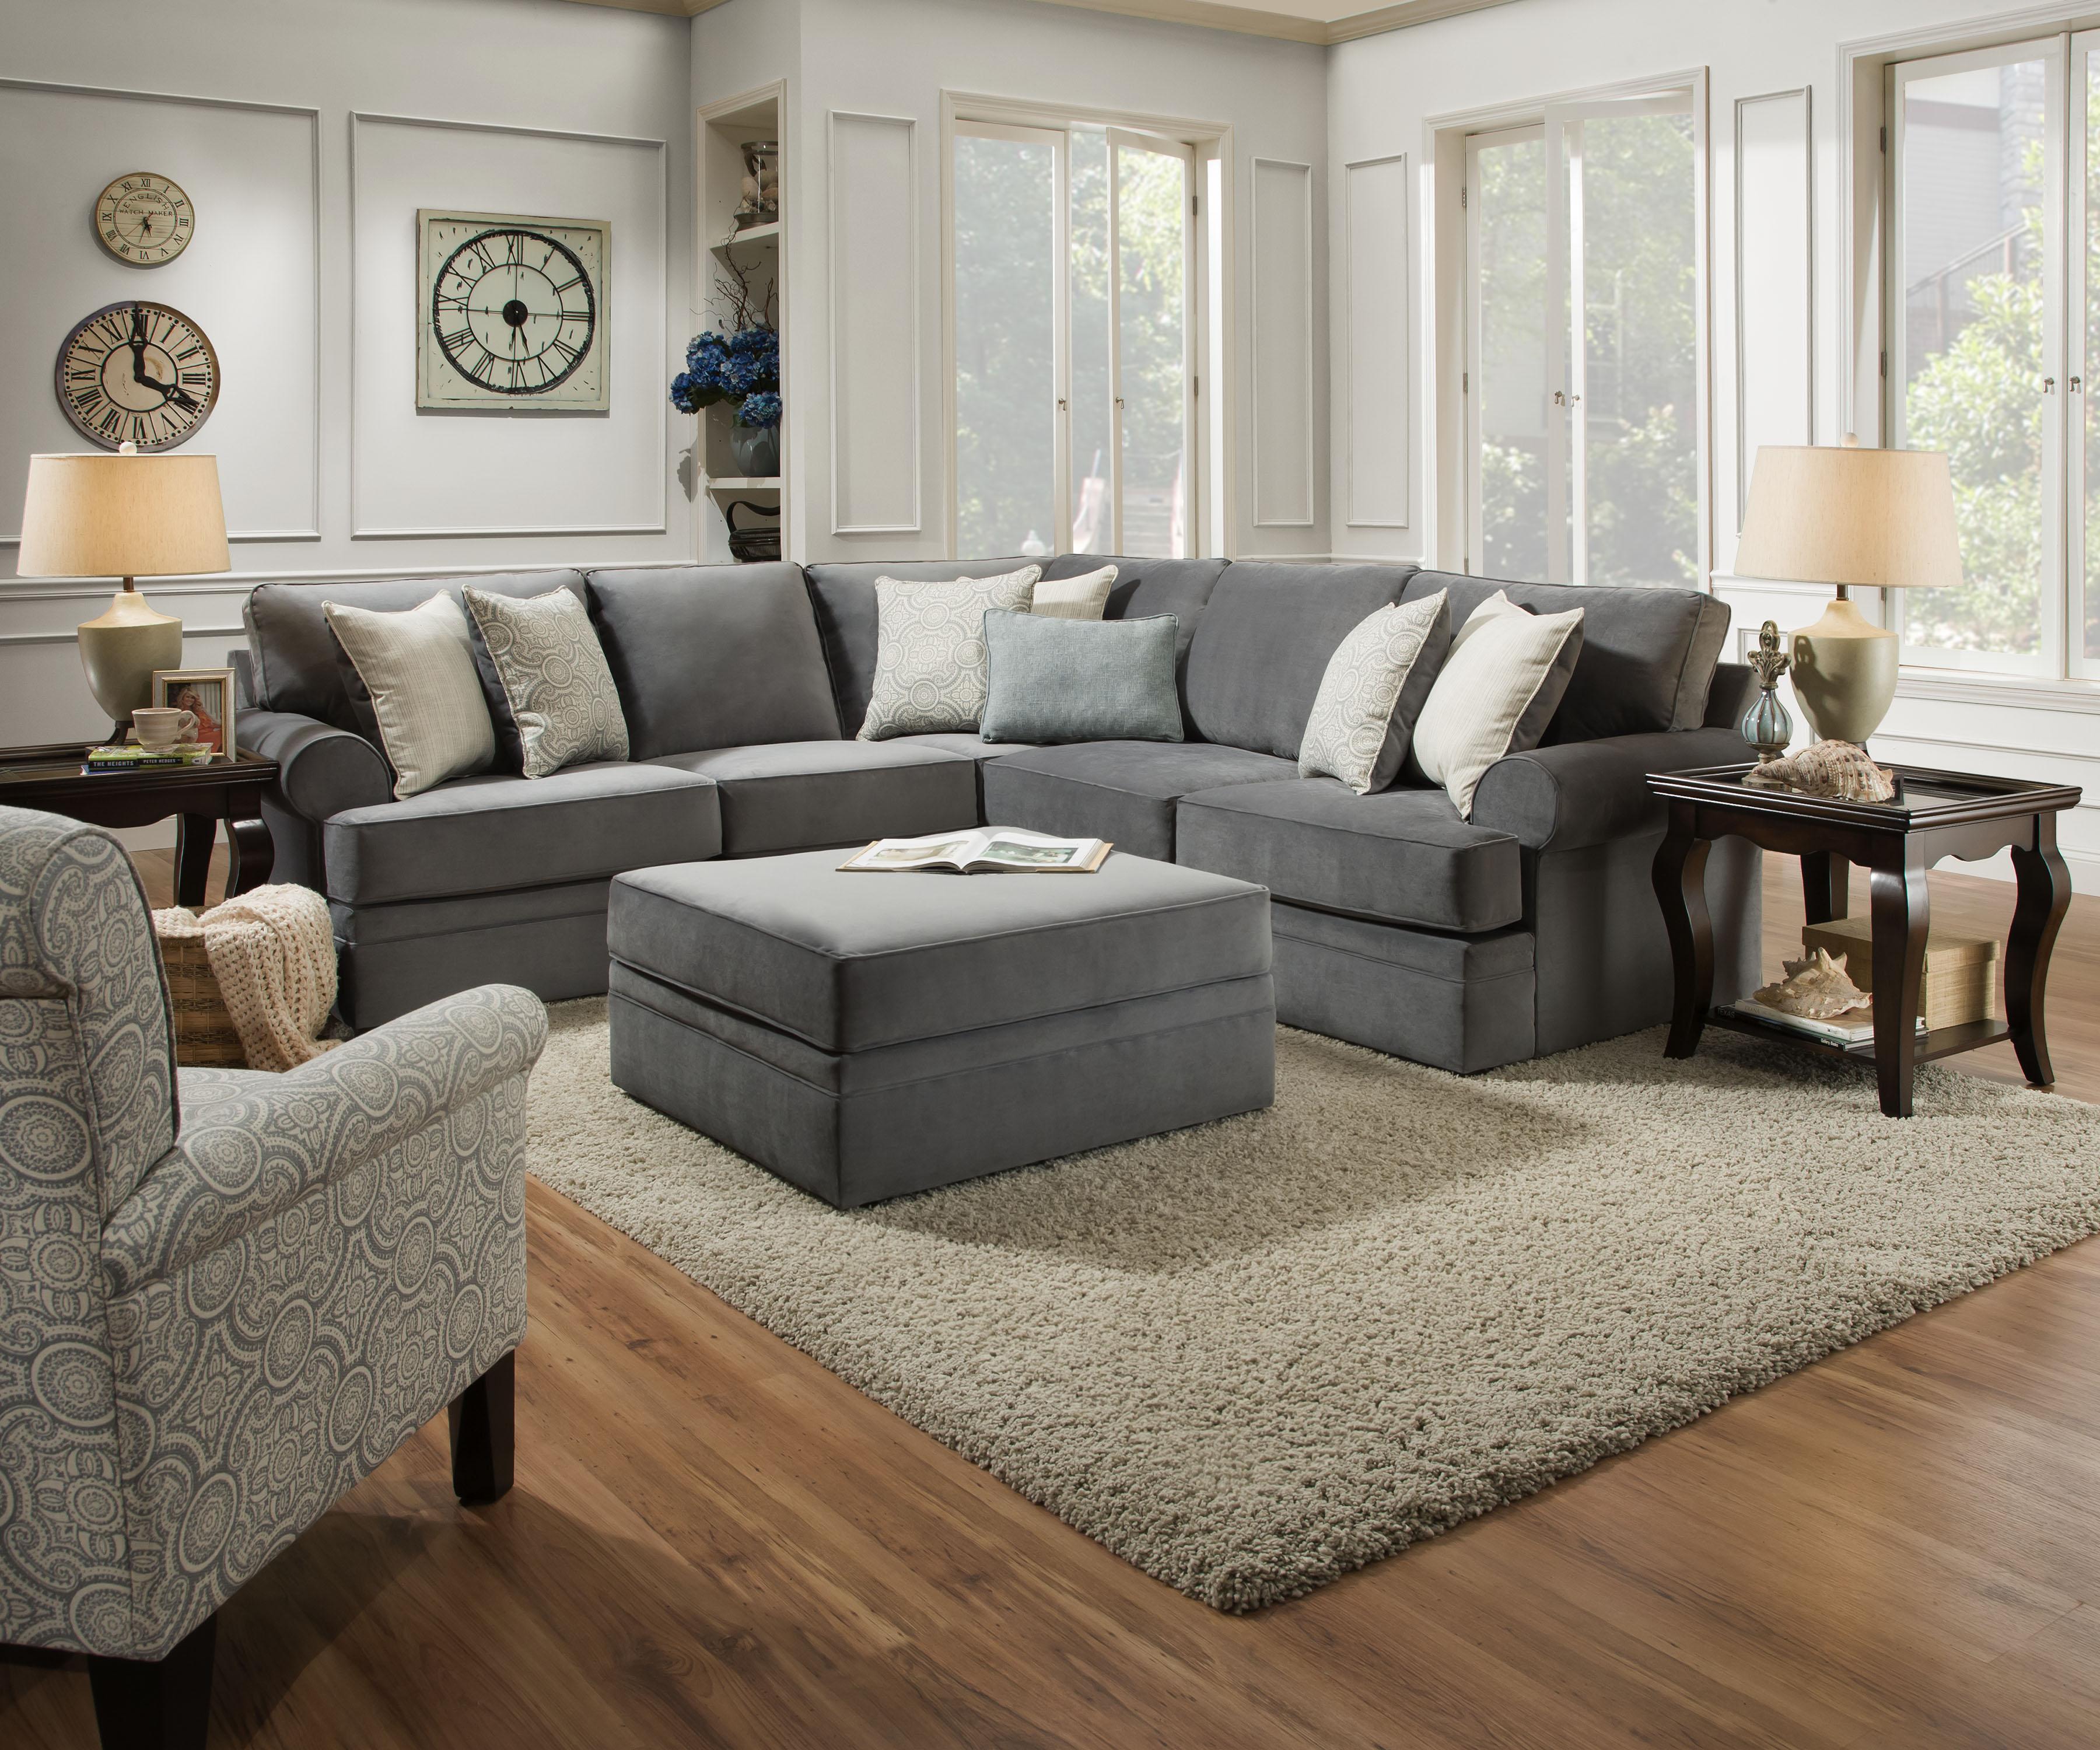 Simmons Bluebell Laf Bump Sofa Abbington Seven Seas